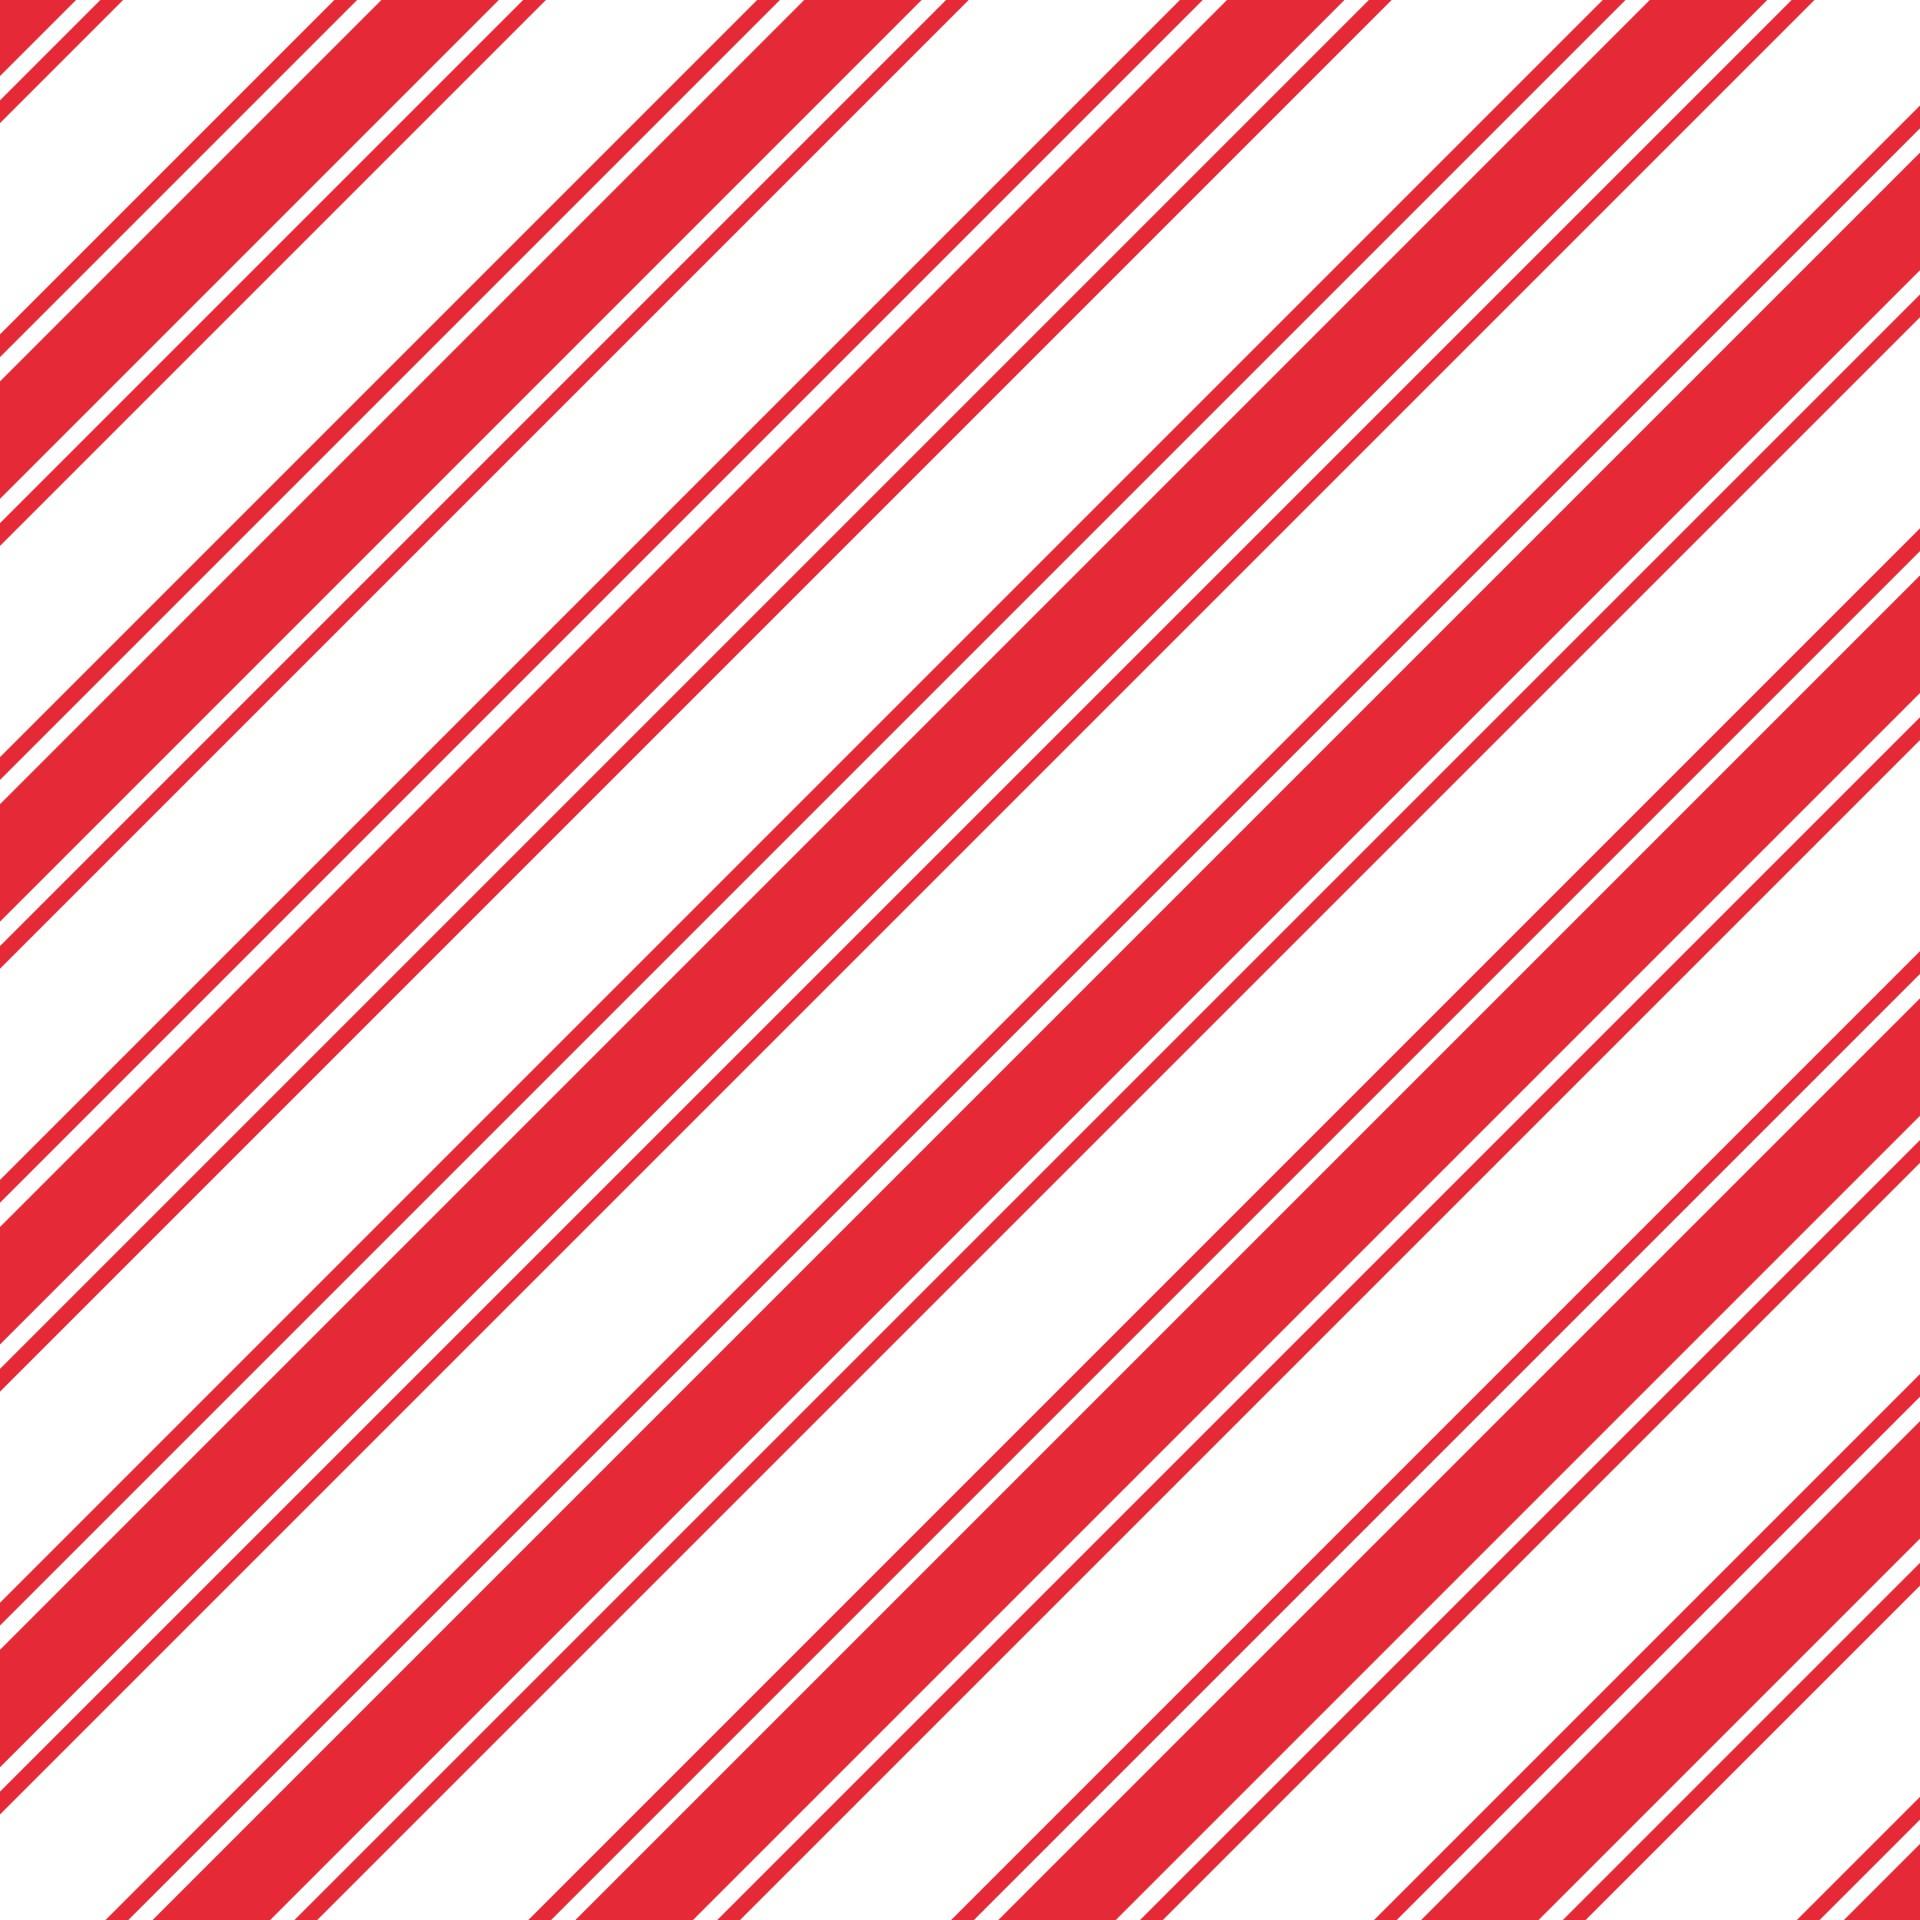 Alizarin Crimson Stripes Pattern Free Stock Photo - Public Domain ...